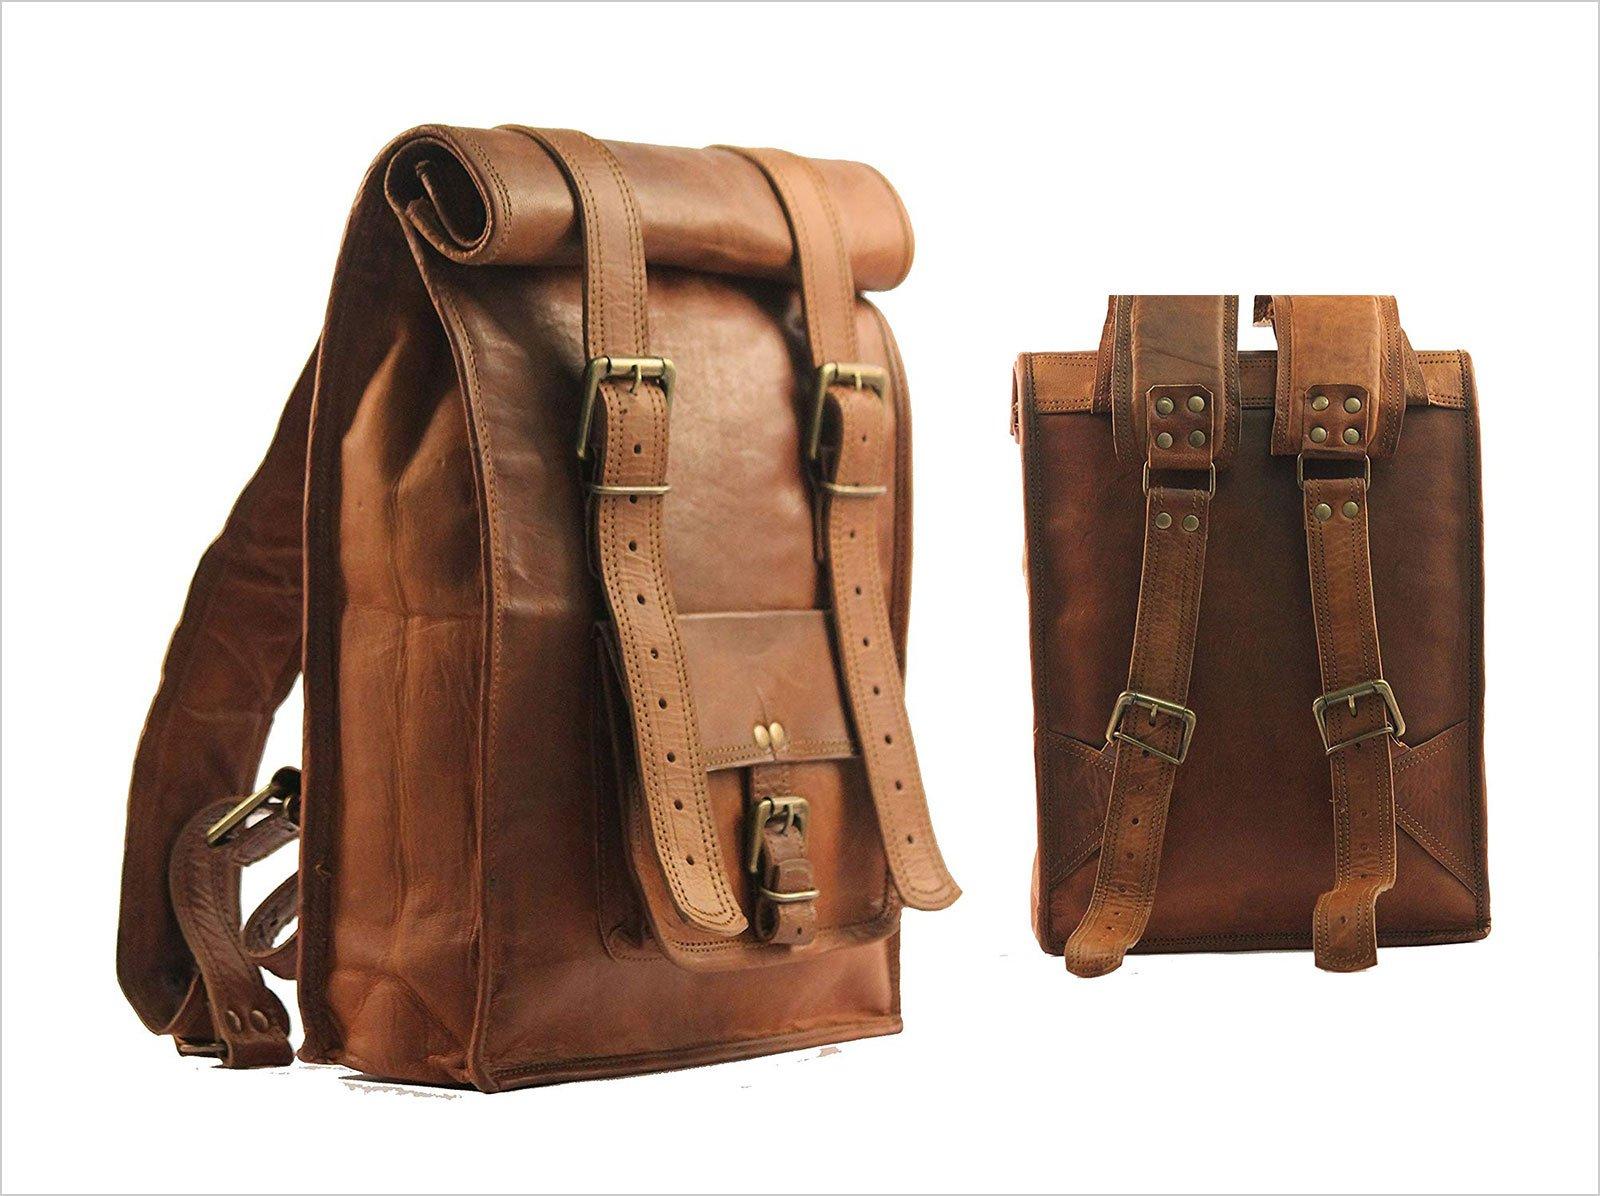 World-15-Inches-Brown-Vintage-Leather-Backpack-Laptop-Messenger-Bag